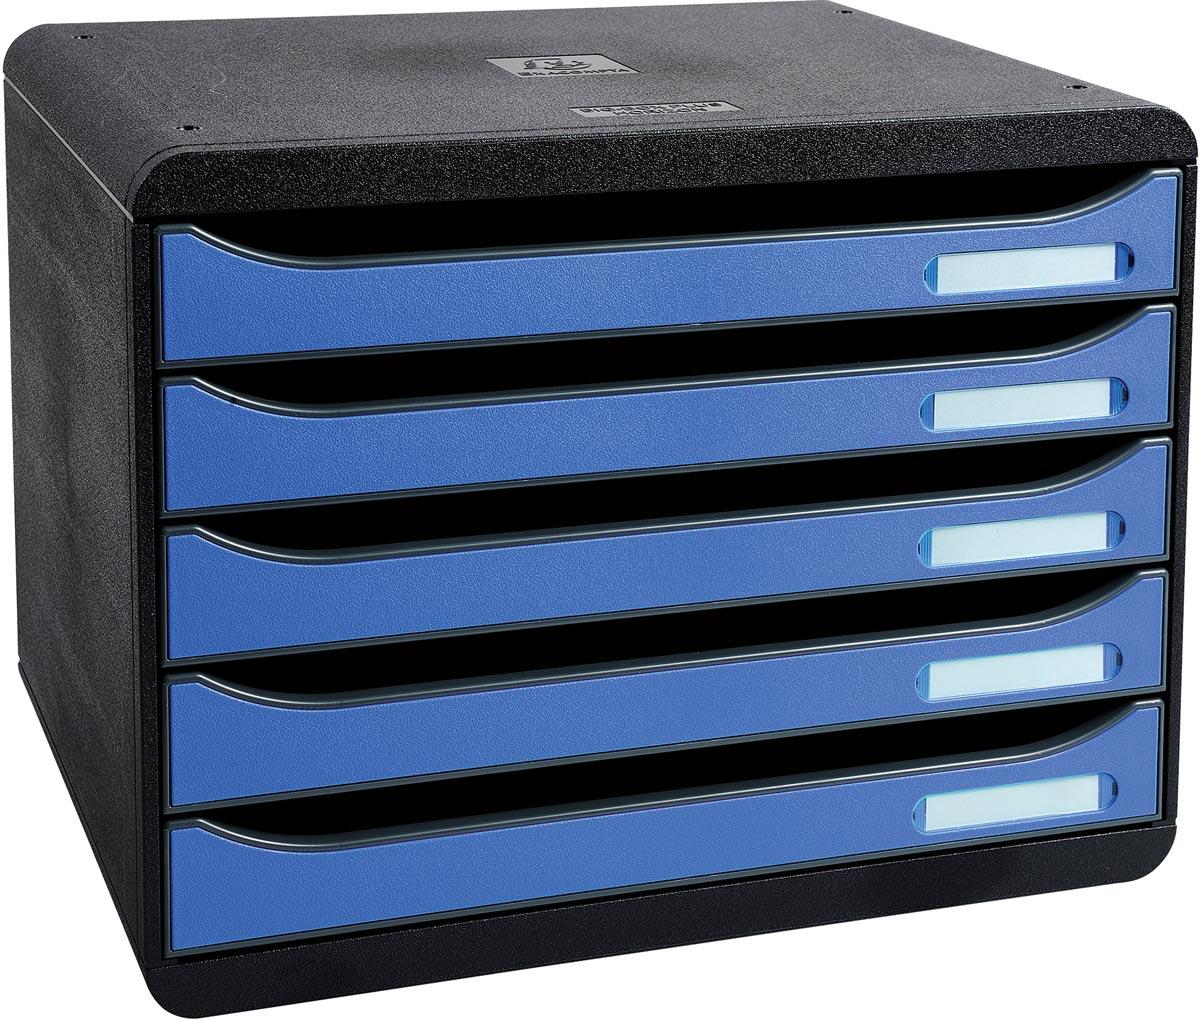 Exacompta ladenblok Big-Box Plus, horizontaal, zwart/ijsblauw